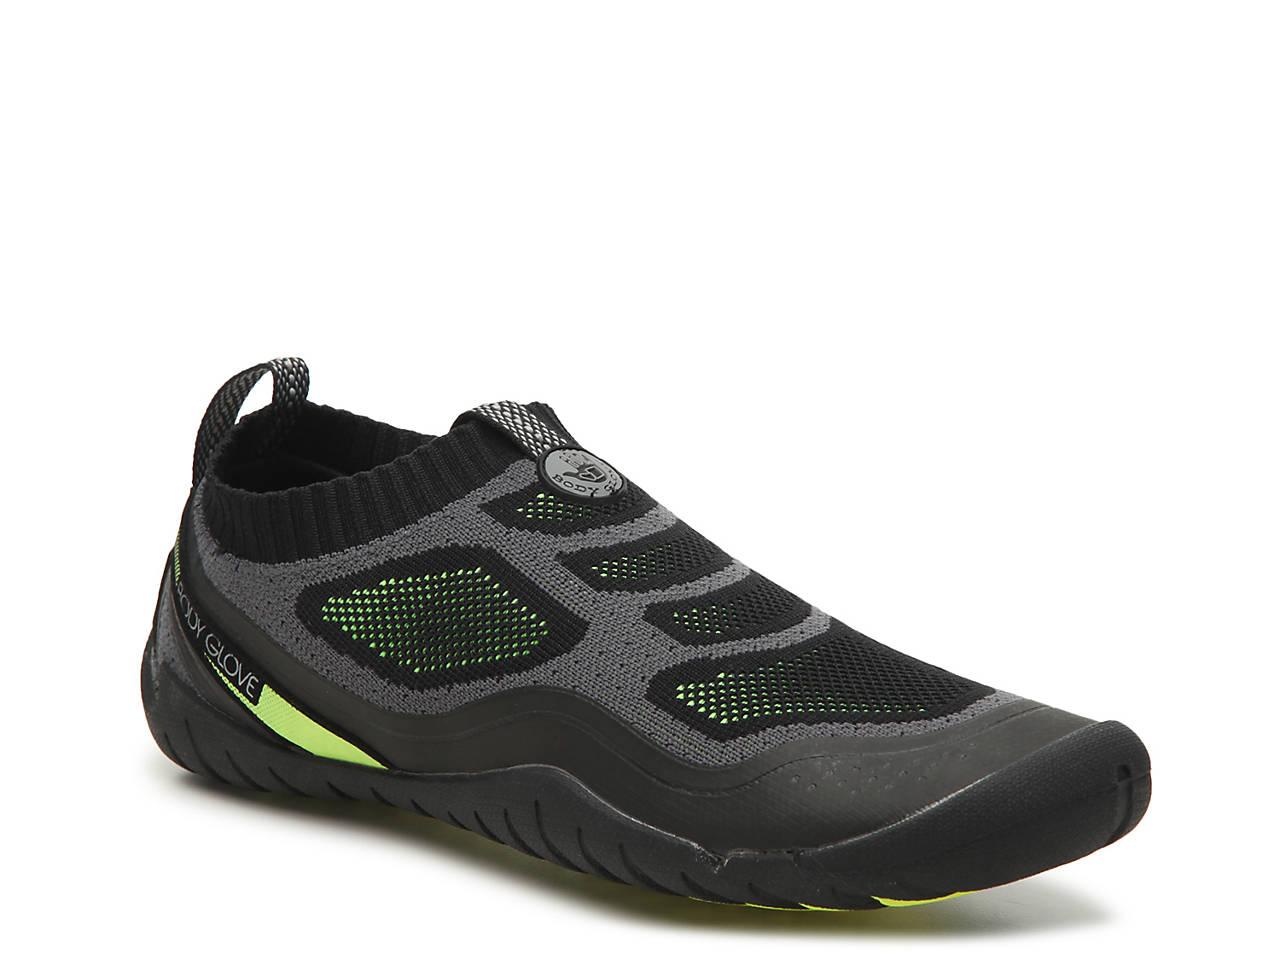 101f79e1f5170 Aeon Water Shoe